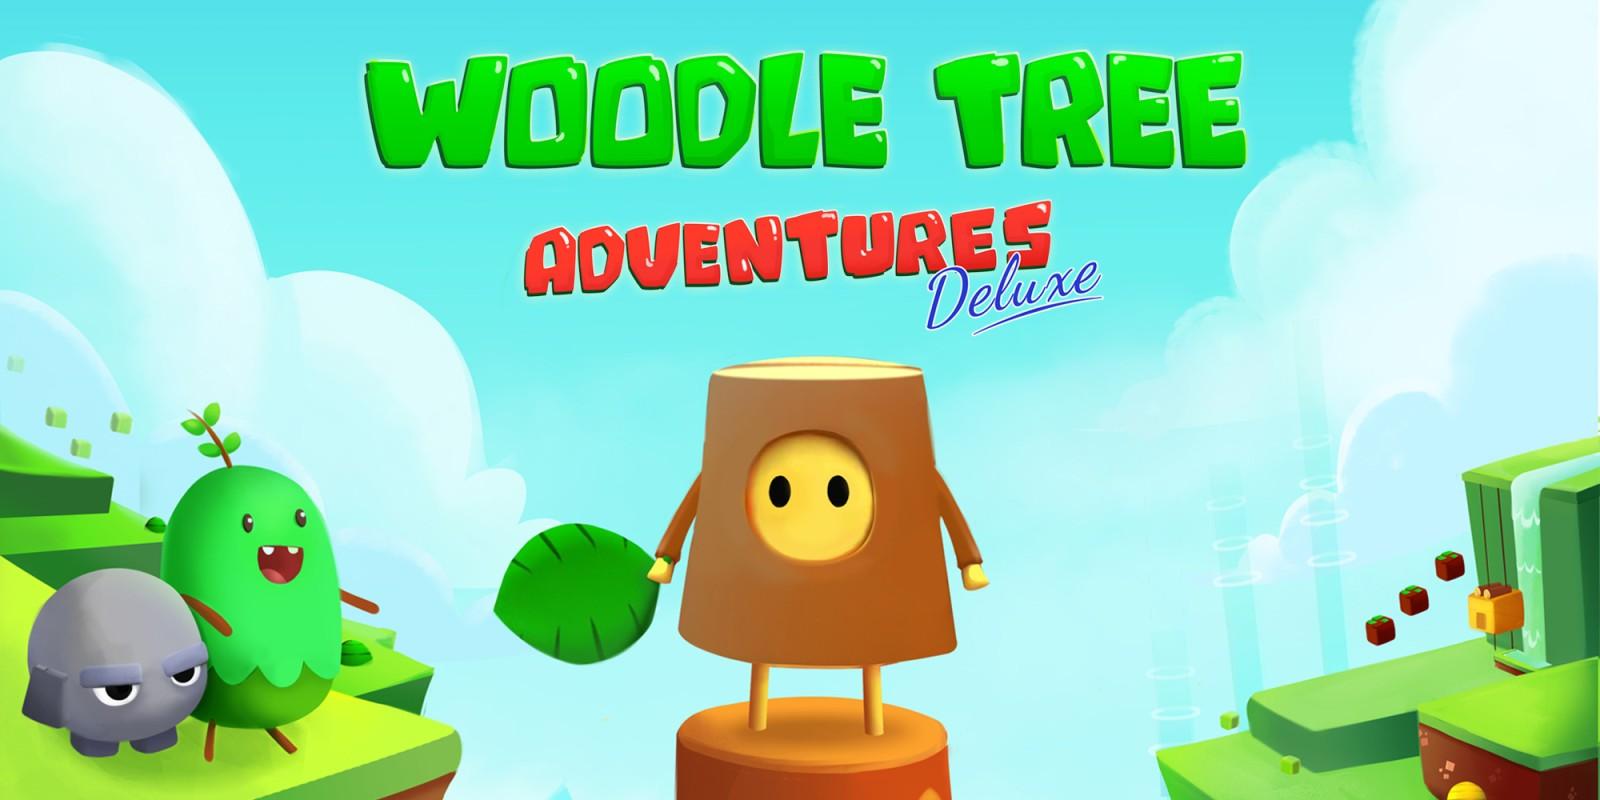 Woodle Tree Adventures vendeu 100 mil cópias no Nintendo Switch, Woodle Tree 2: Deluxe vindo no próximo mês